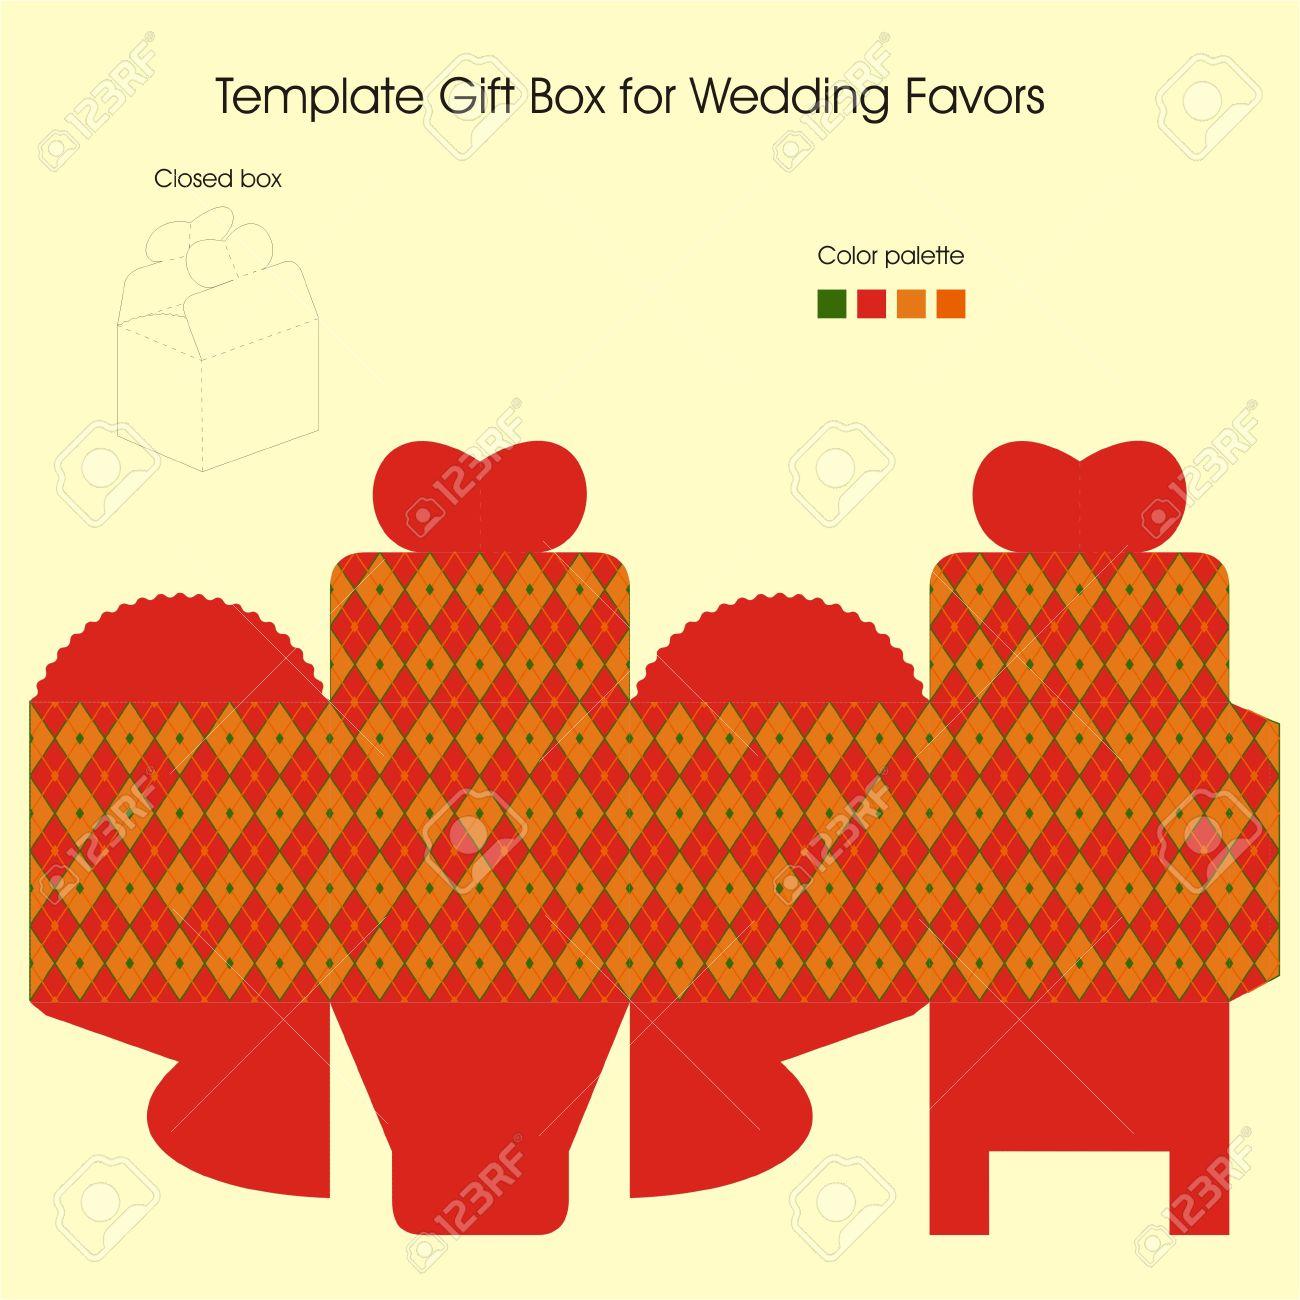 template gift box for christmas present royalty cliparts template gift box for christmas present stock vector 15921439